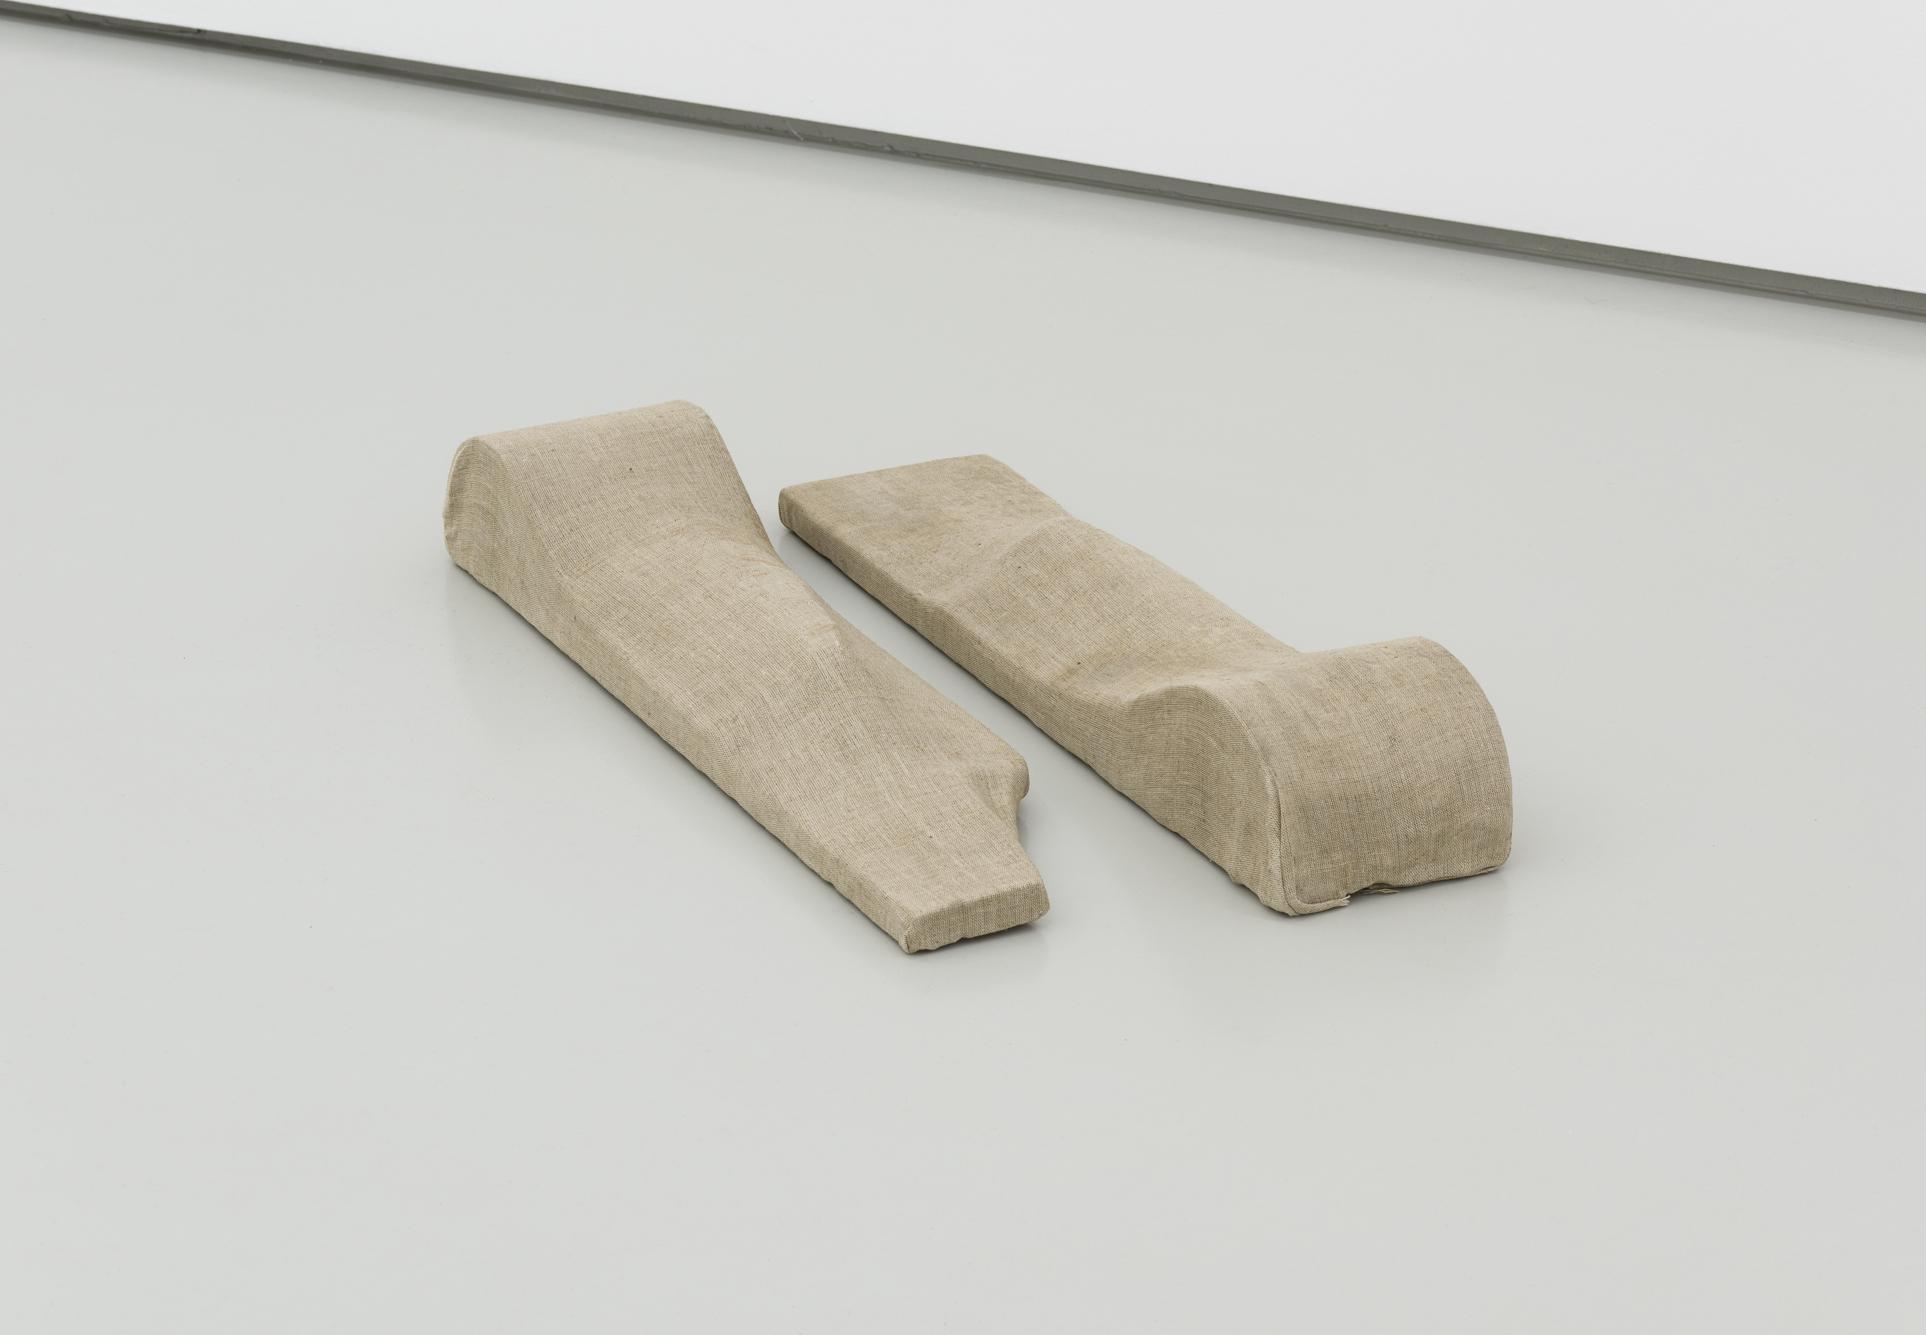 Ferenc Ficzek, Untitled, 1983, formed canvas, wood, 65 x 15 x 10 cm each. Photo: Marcus Schneider